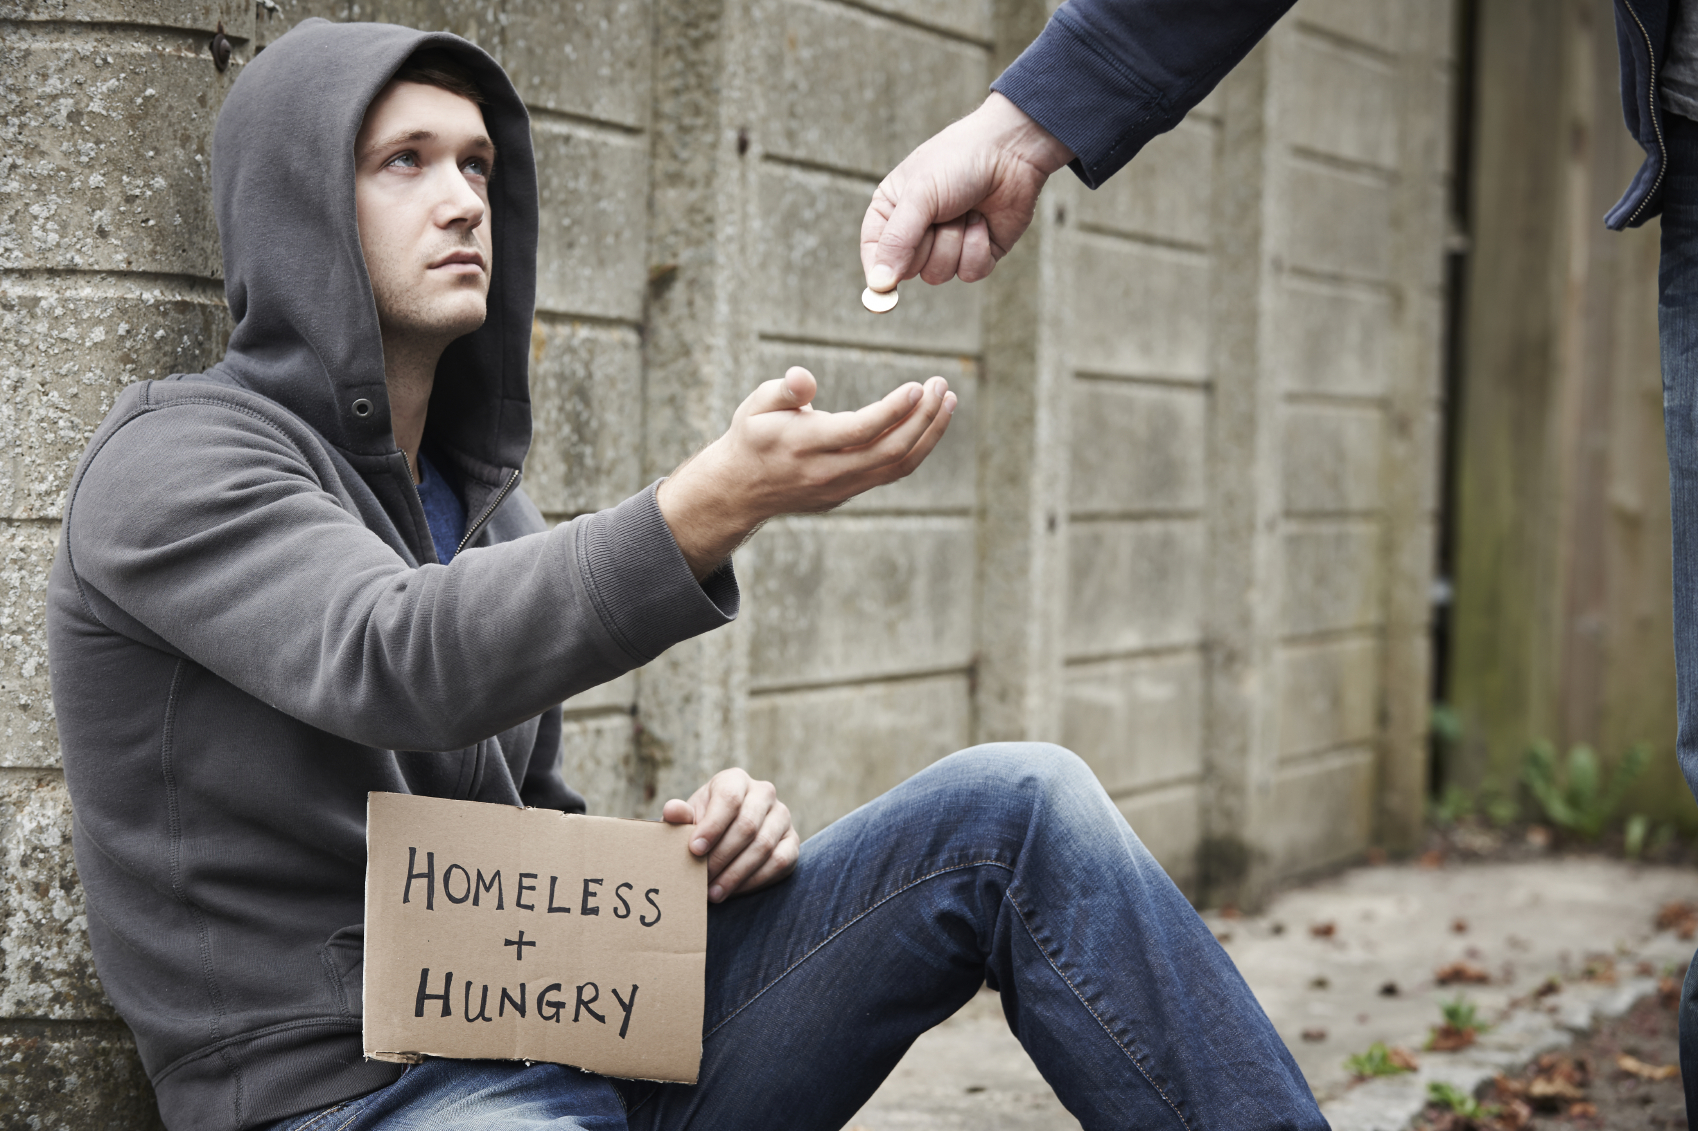 Man Giving Money To Beggar On Street